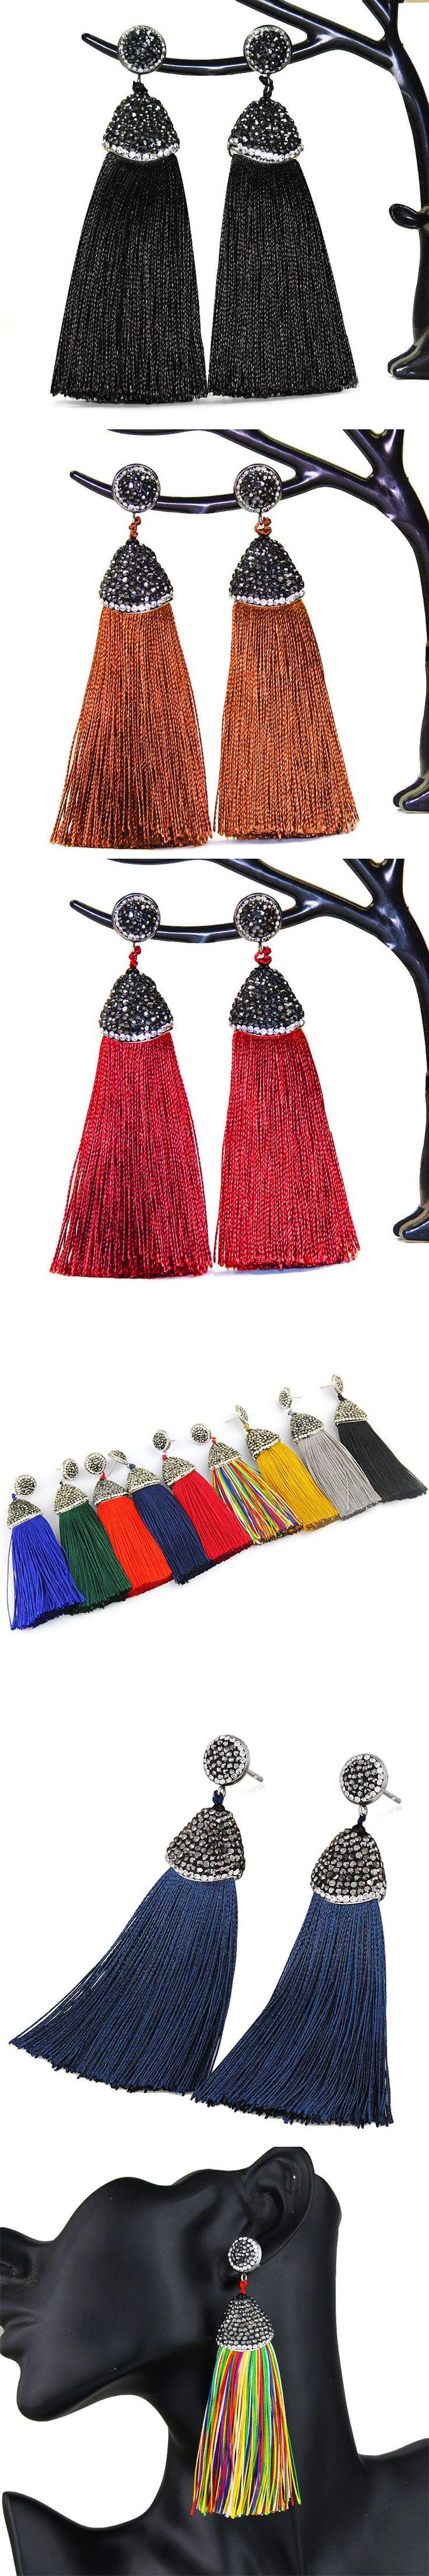 Bohemia Crystal Silk Tassel Earrings Handmade High Quality Black Burgundy Long Drop Tassel Dangle Earrings For Women Jewelery